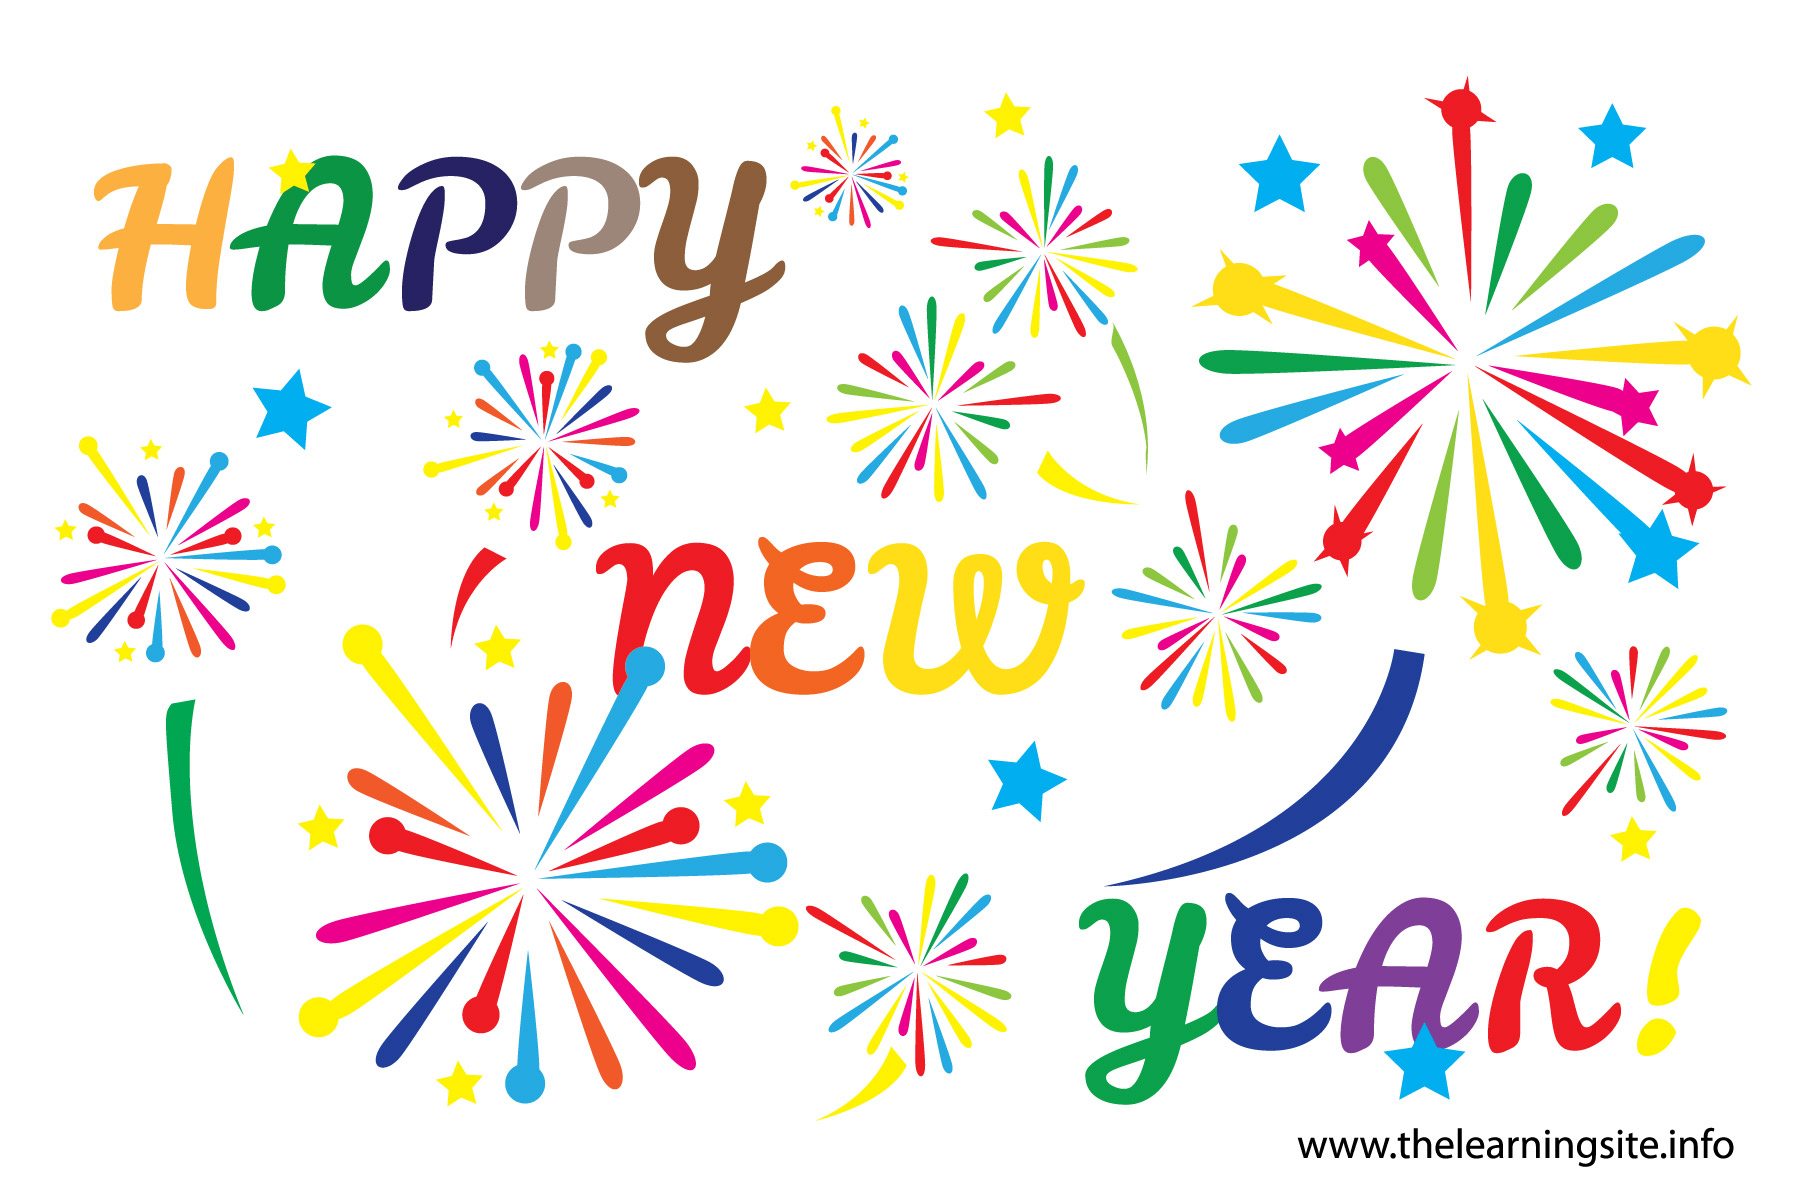 Happy New Year Clipart - .-Happy New Year Clipart - .-13